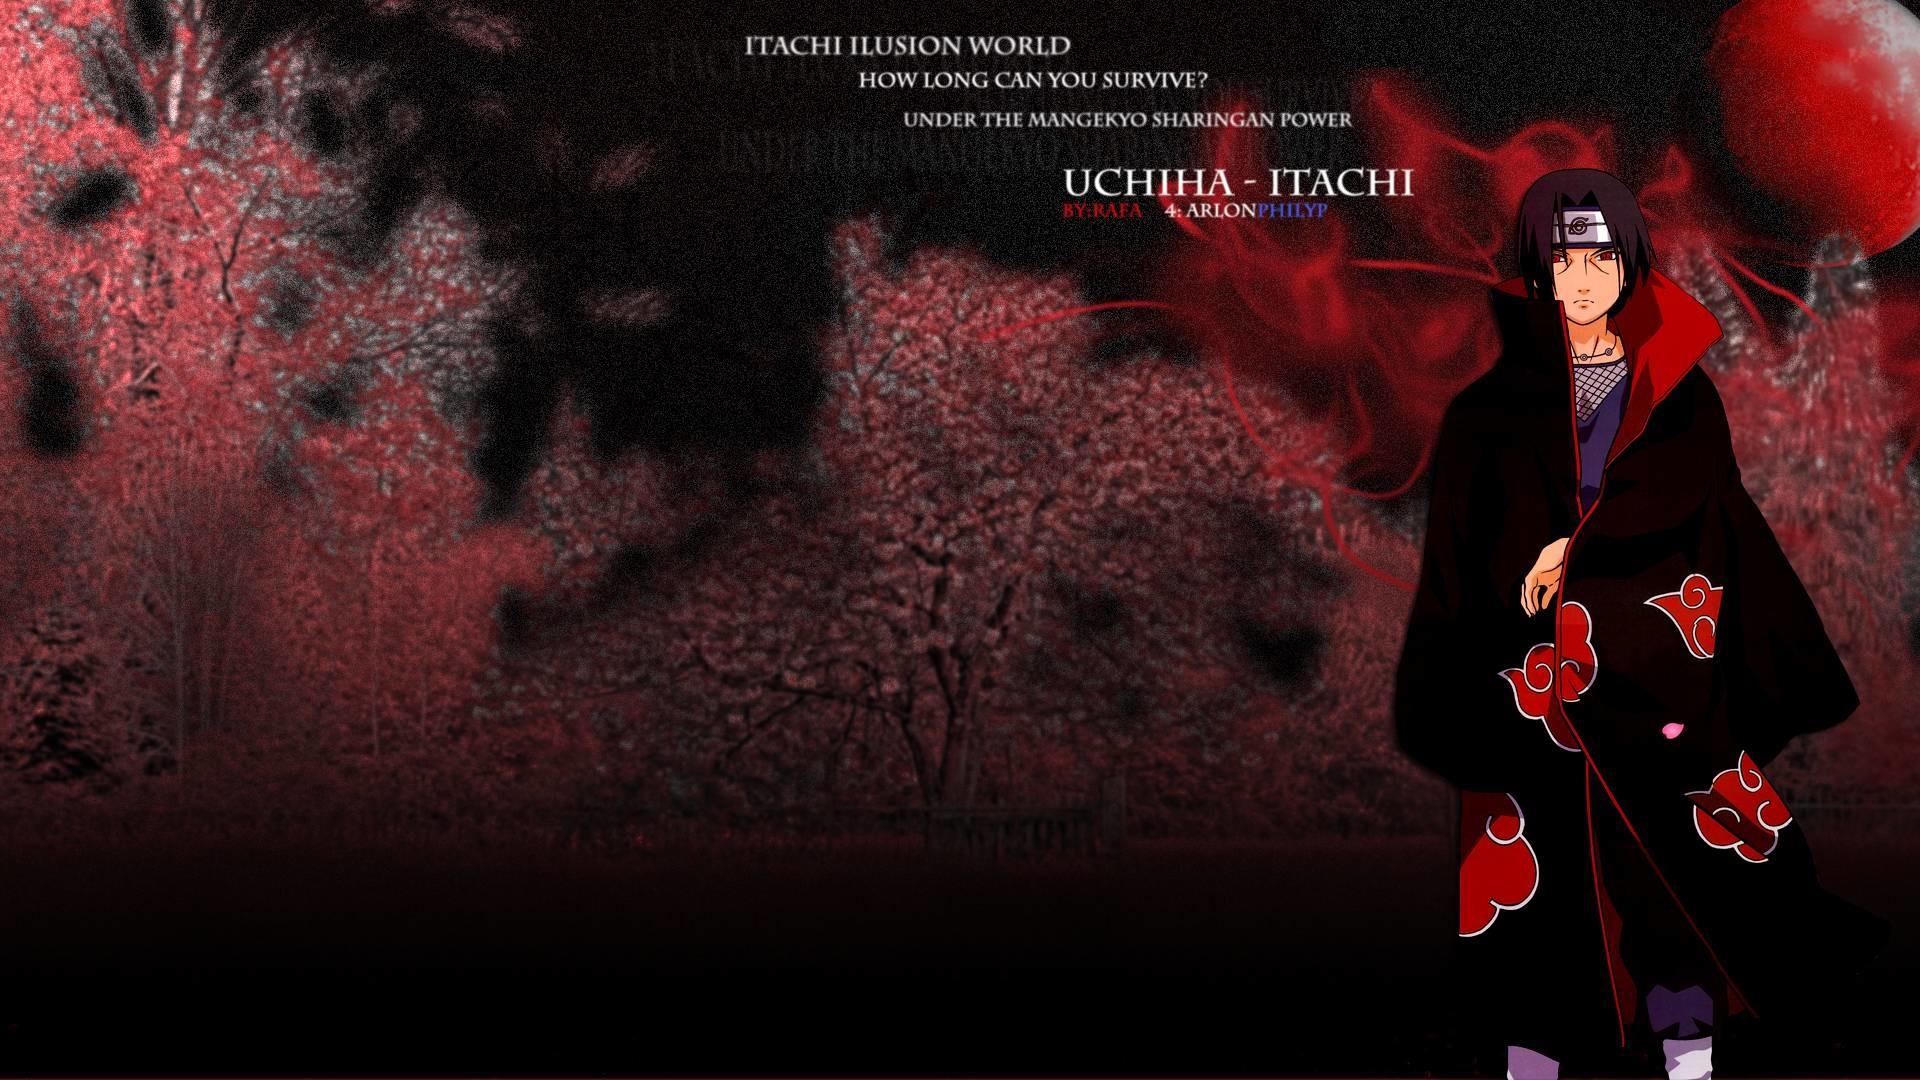 Wallpapers For > Uchiha Itachi Wallpaper 1920×1080